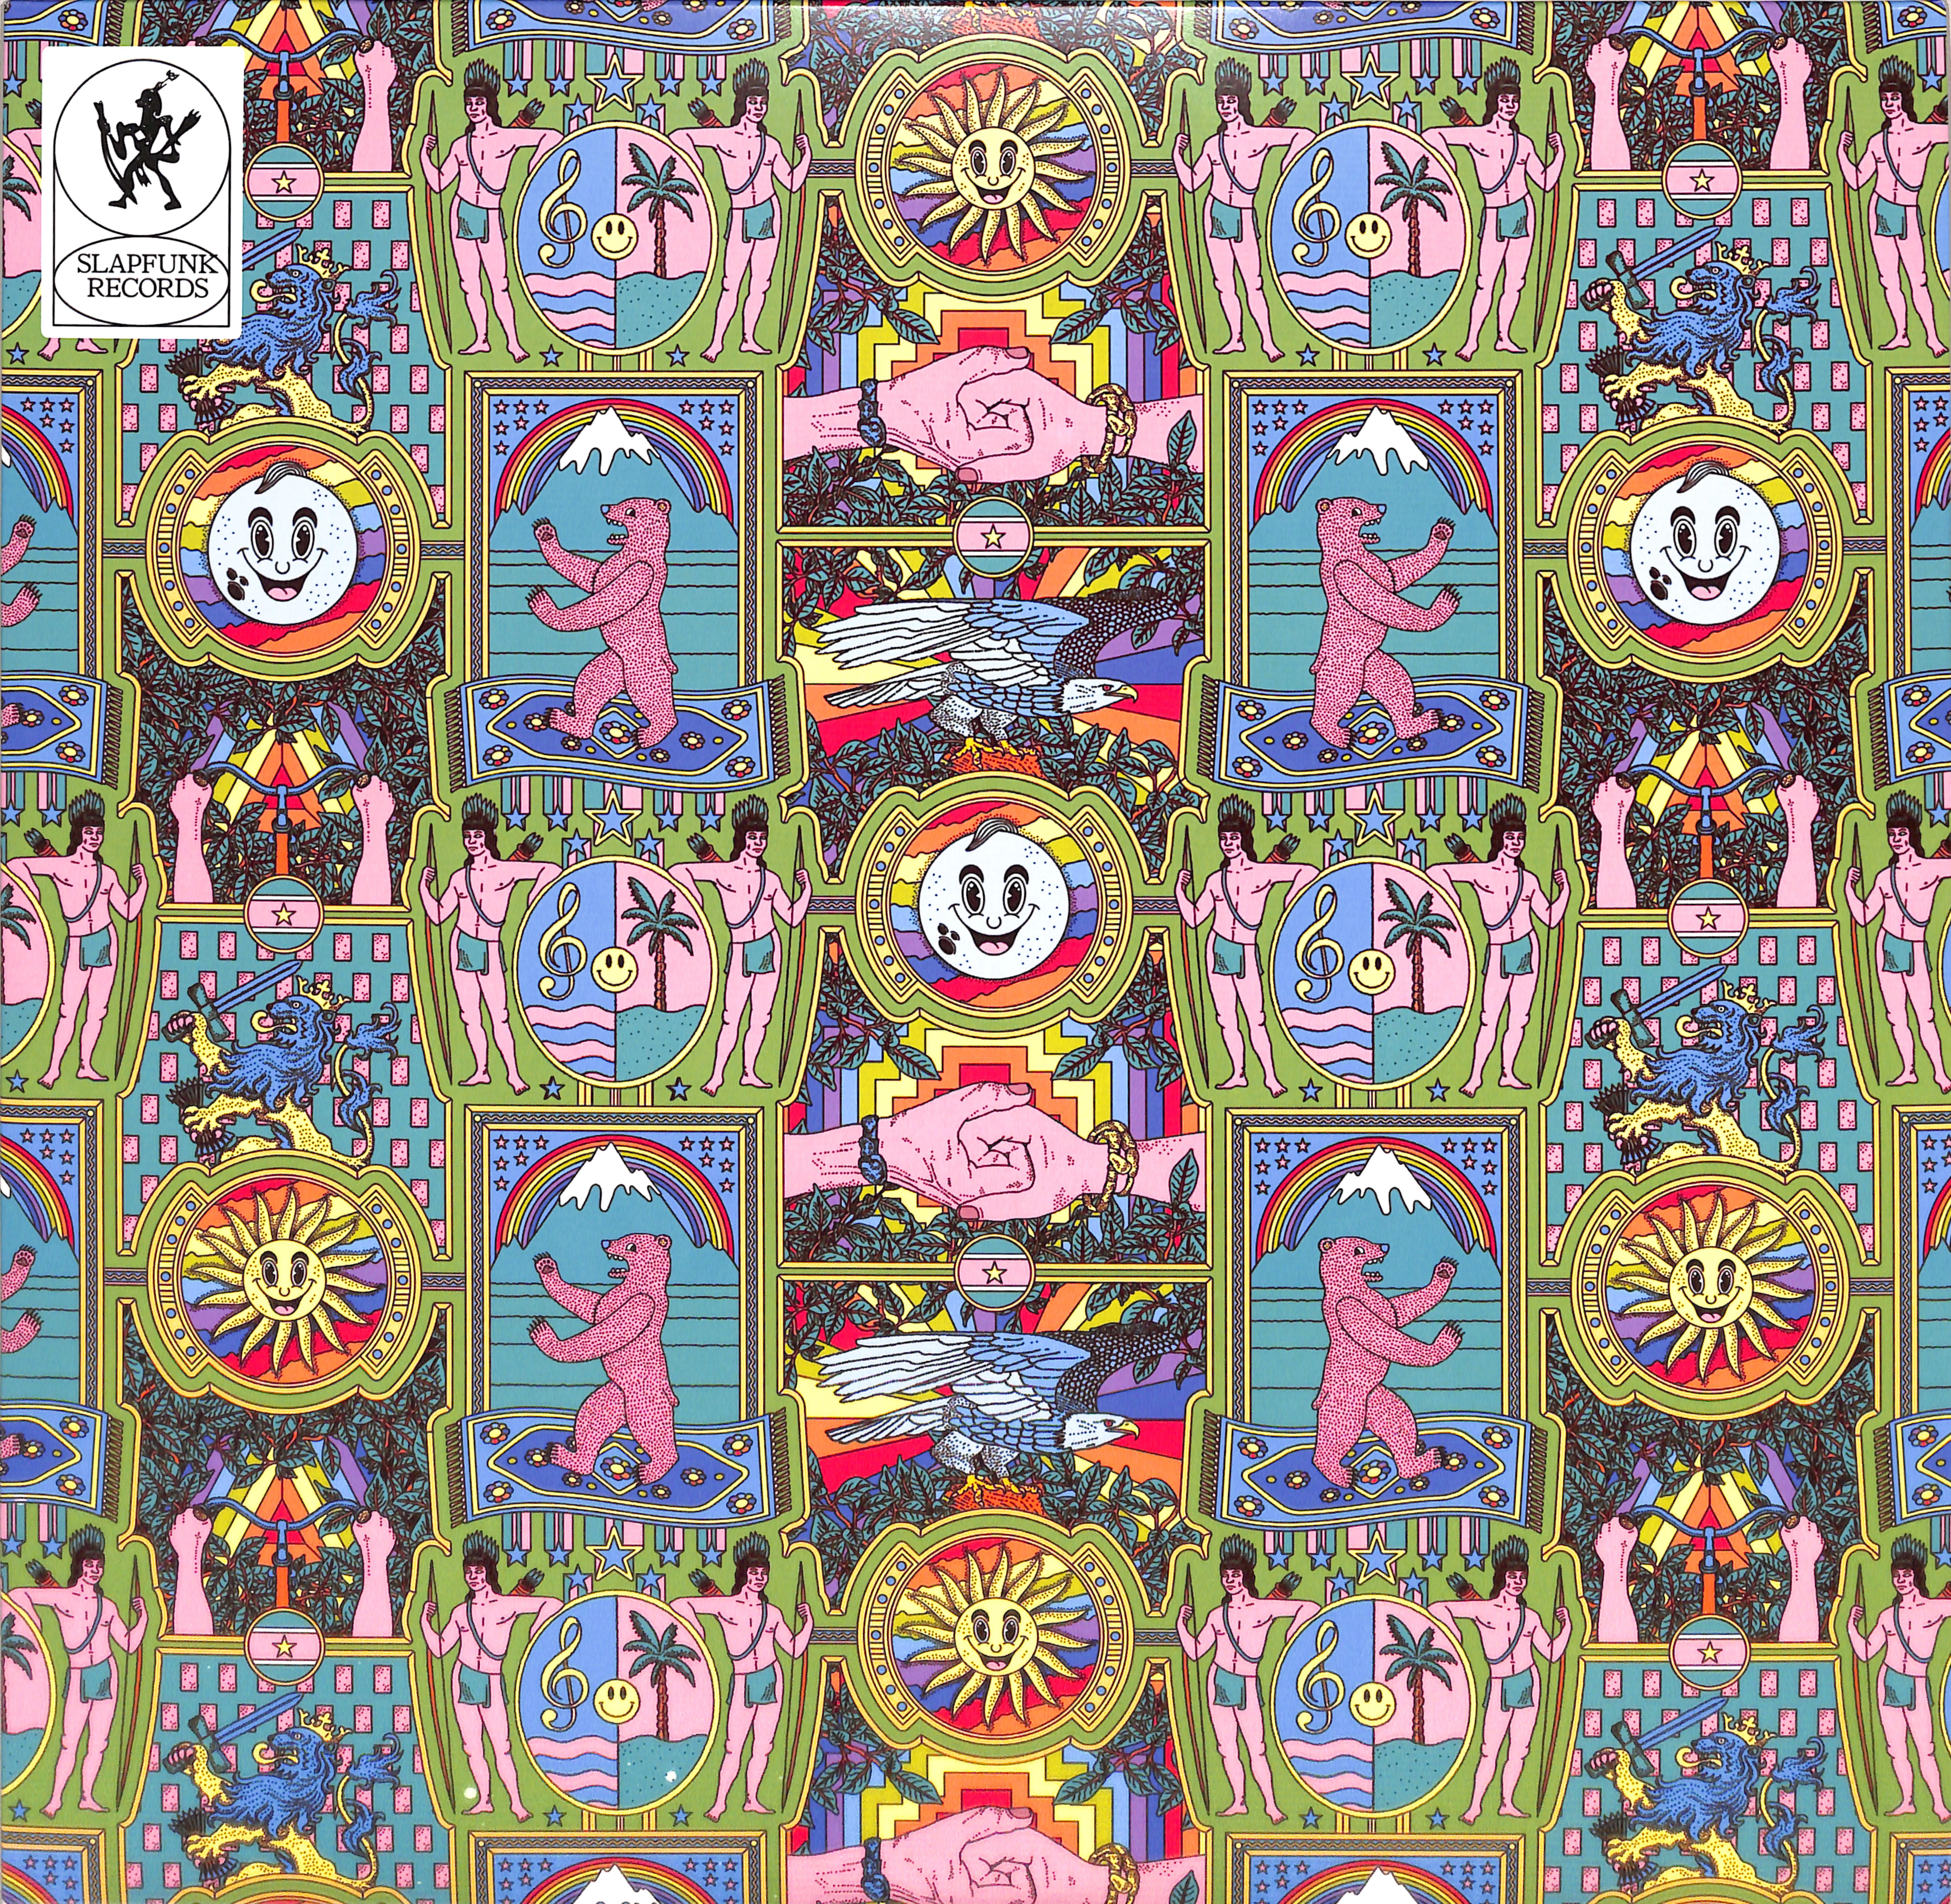 Huerta - AYO SKIDLO EP